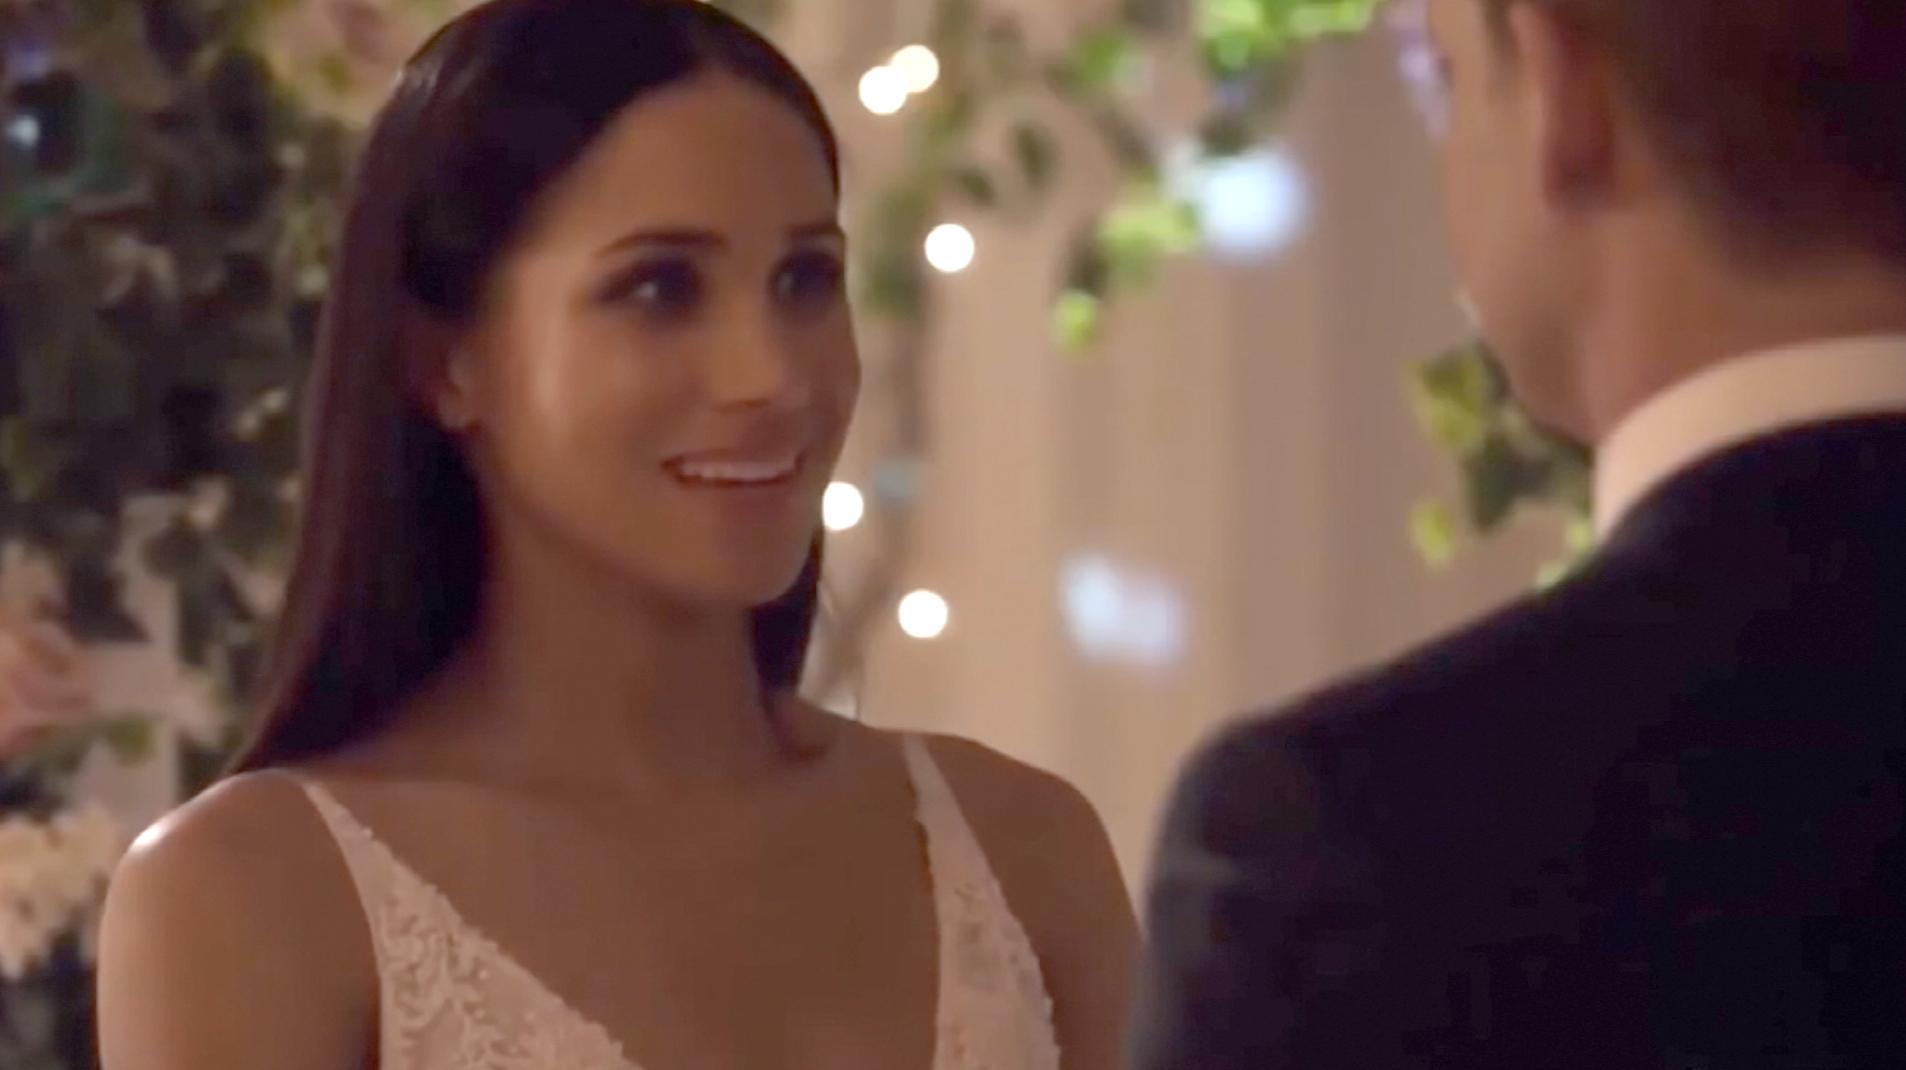 Meghan Markle walks down aisle on \'Suits\' - CNN Video